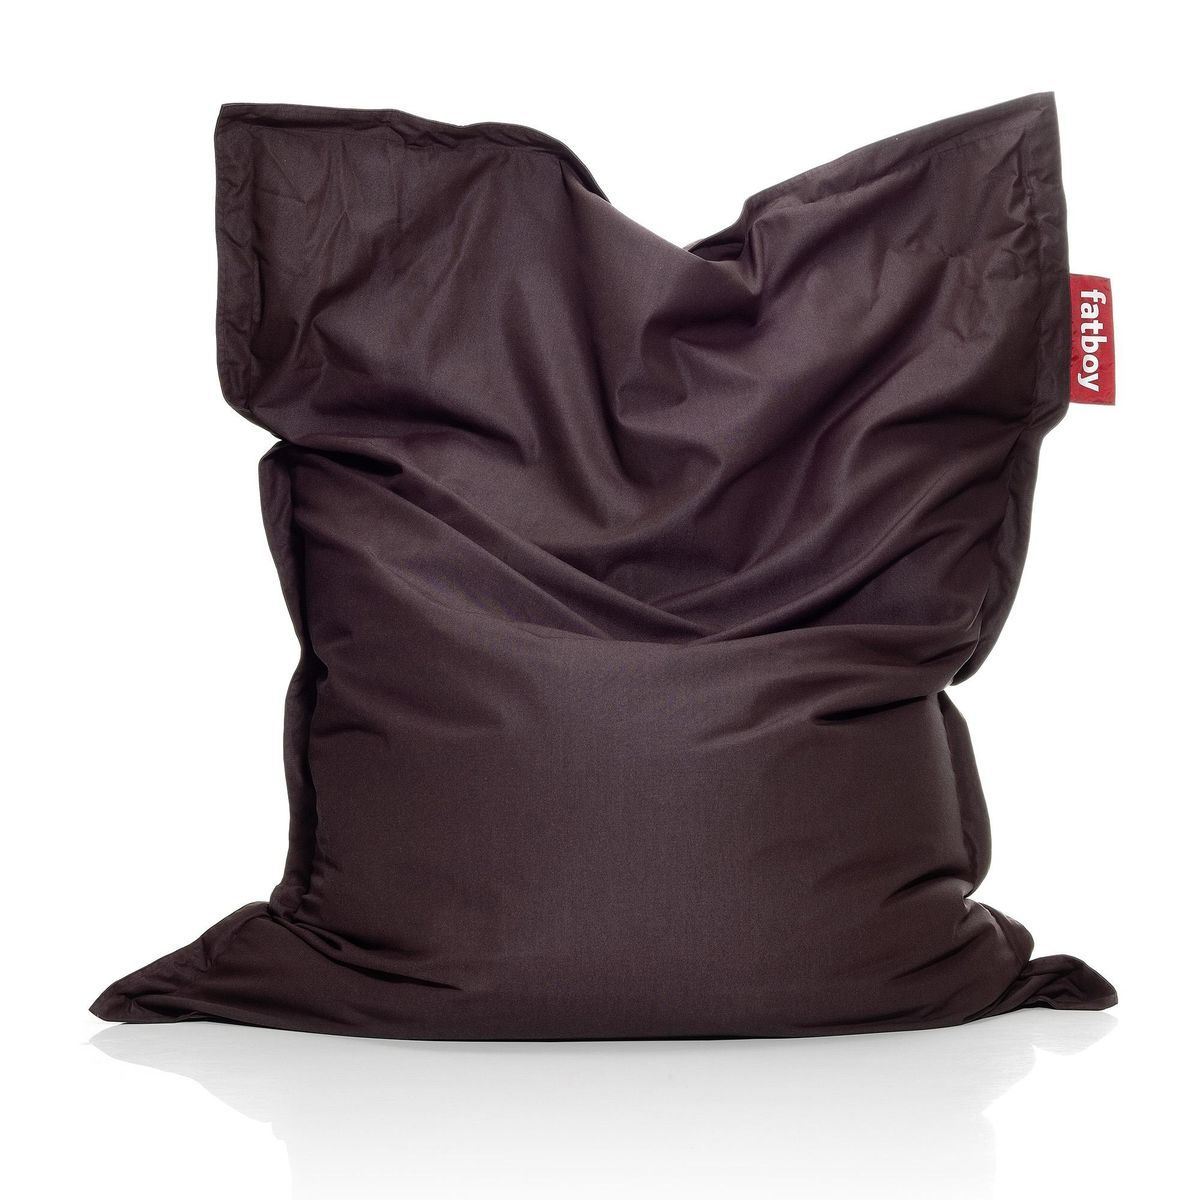 fatboy original outdoor sitzsack fatboy. Black Bedroom Furniture Sets. Home Design Ideas